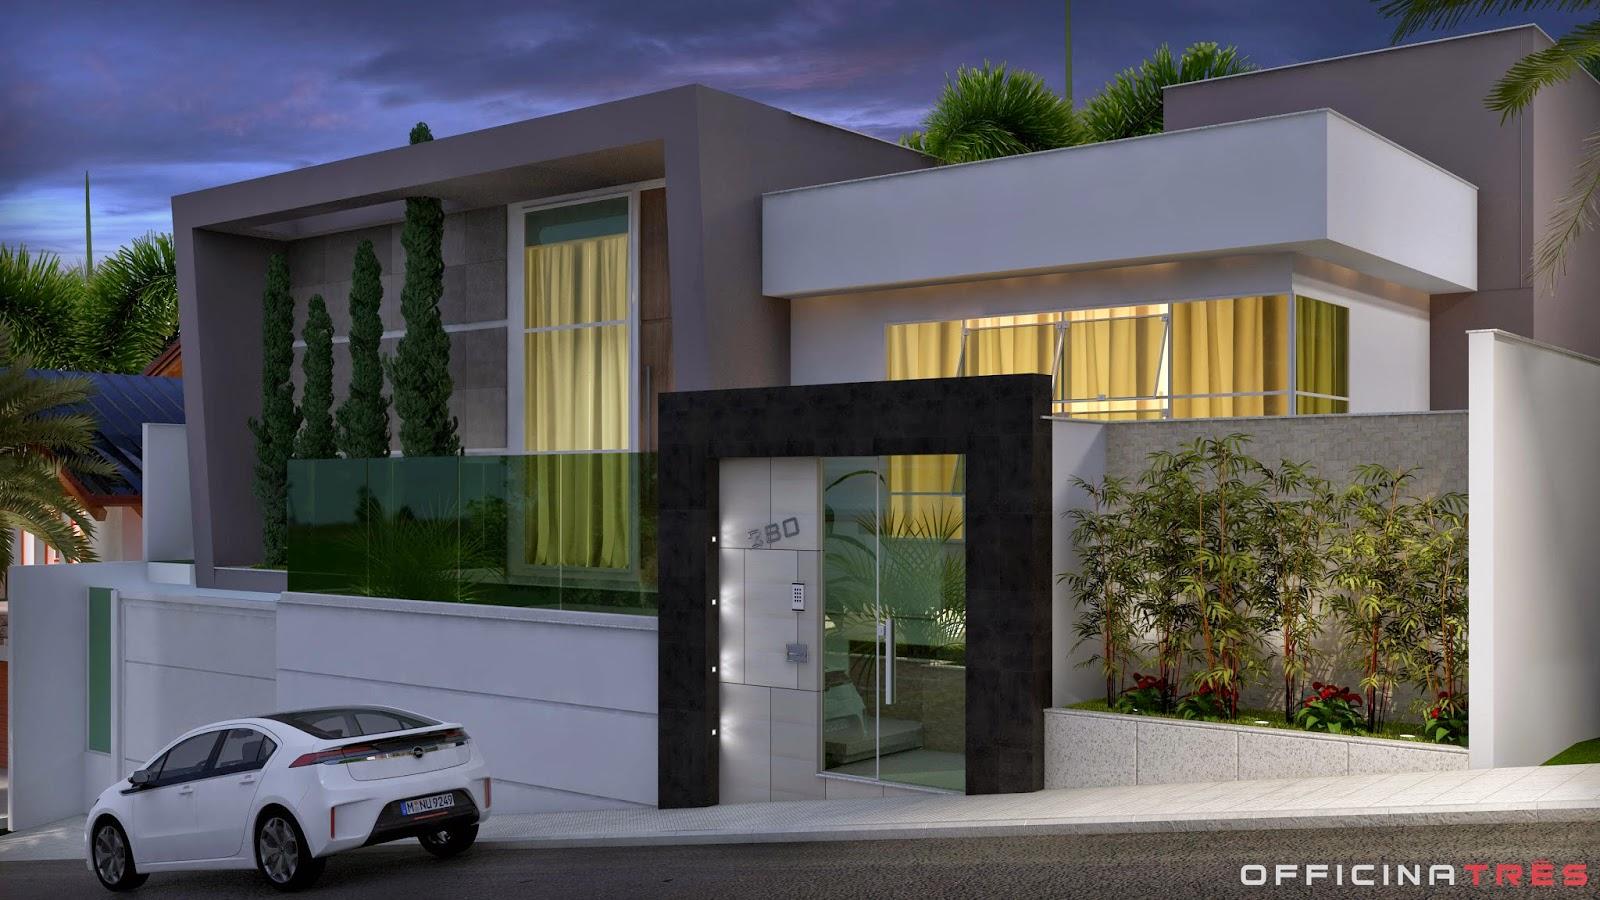 Officinatr s casa moderna loteamento alphaville manhua u mg for Casa moderna 5